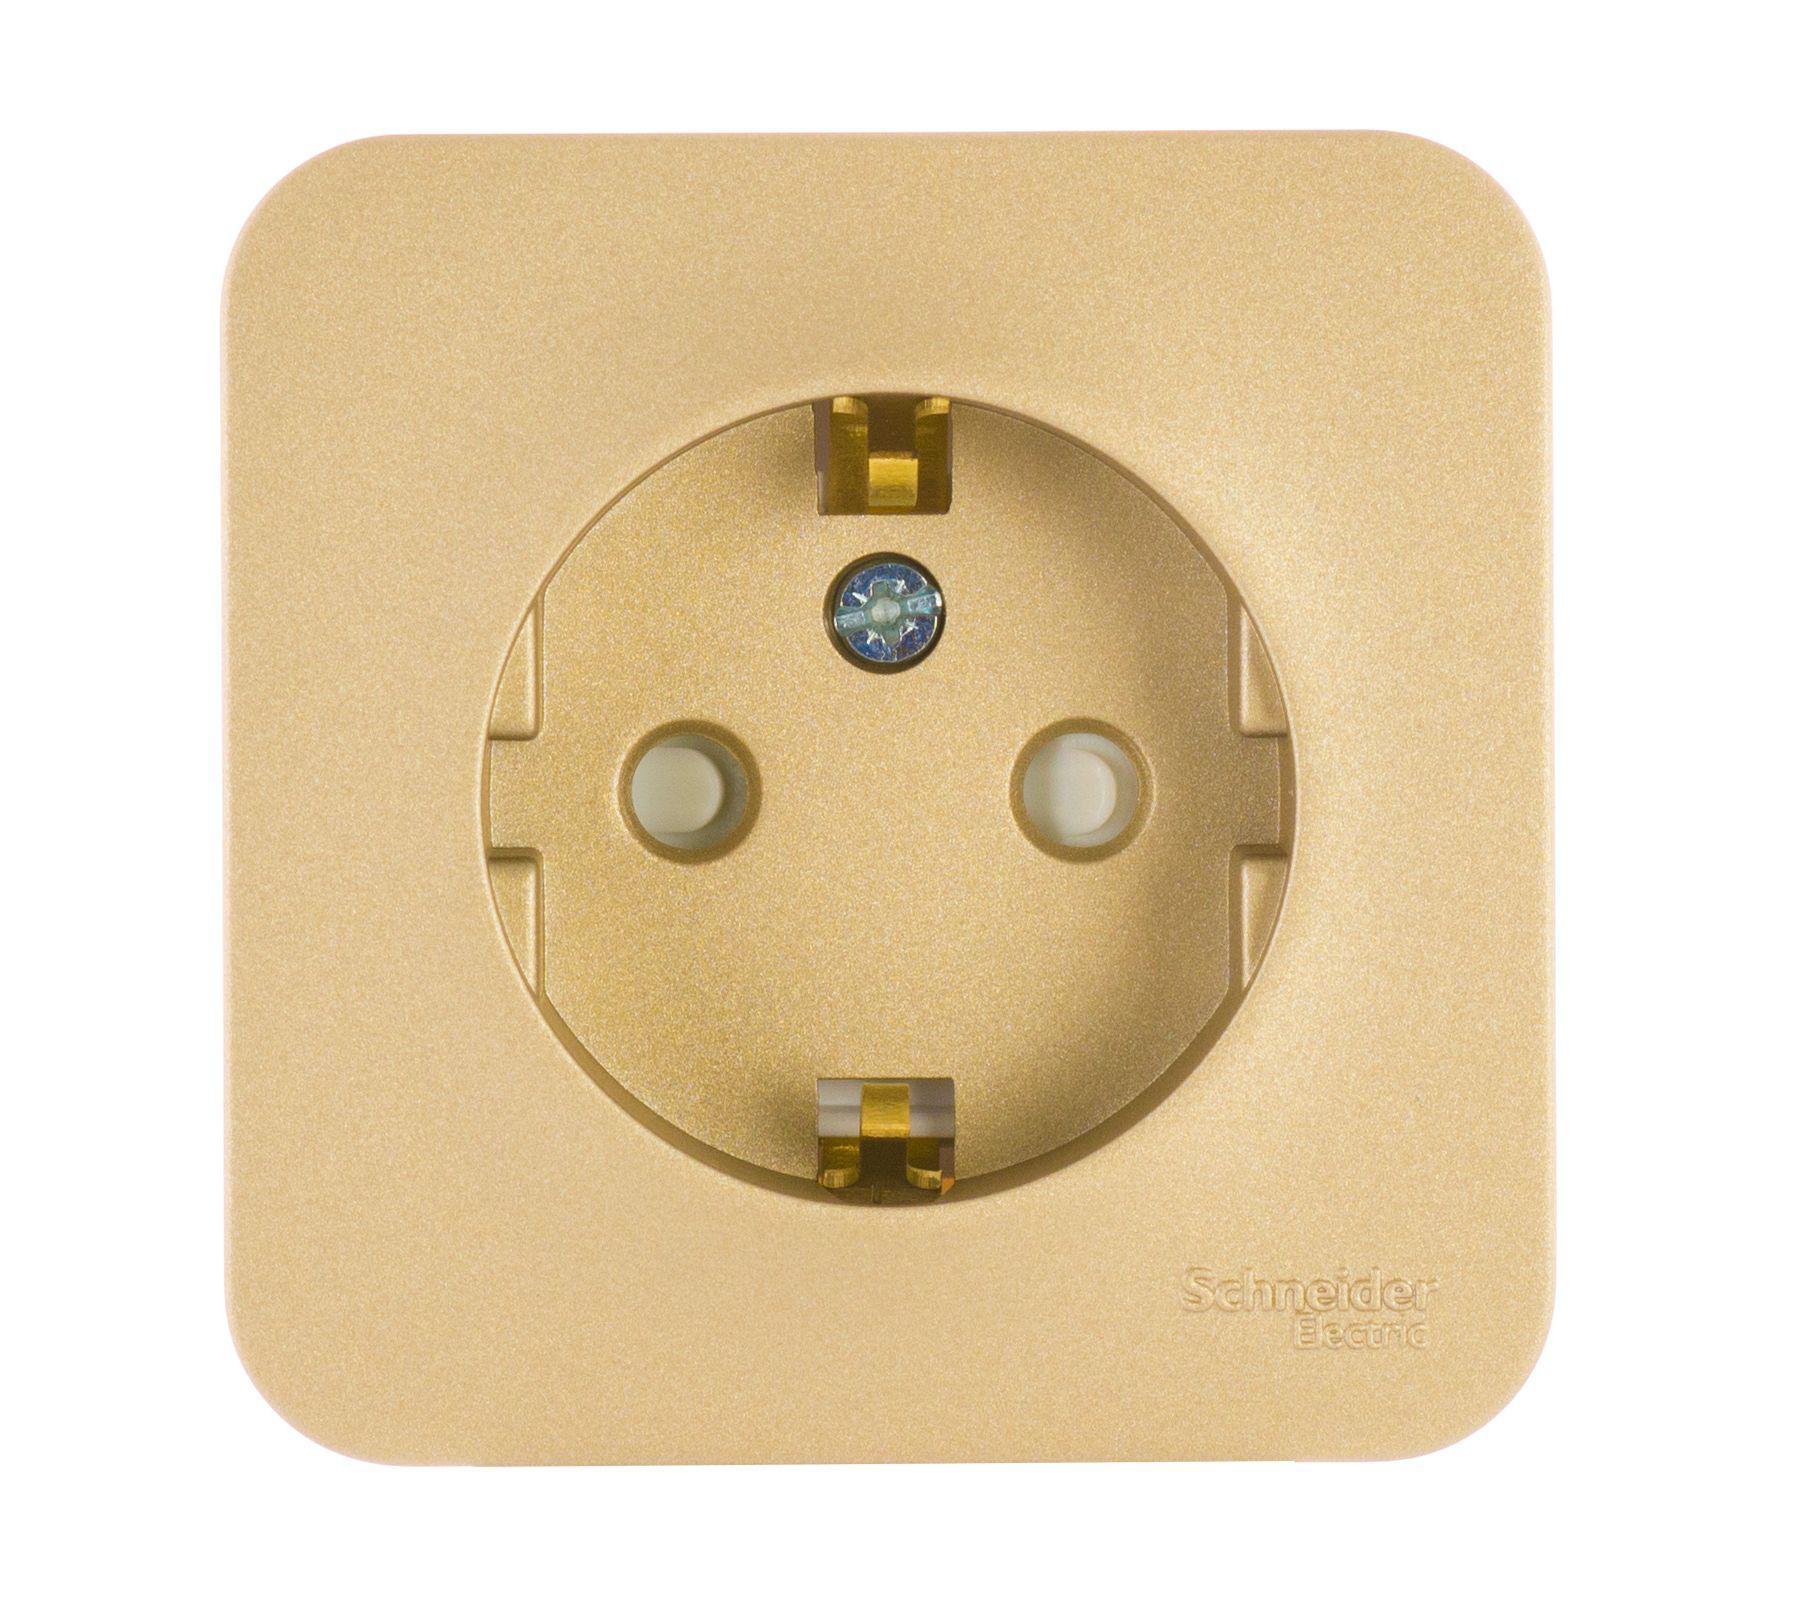 Купить Розетка Schneider electric Blnra011114 blanca